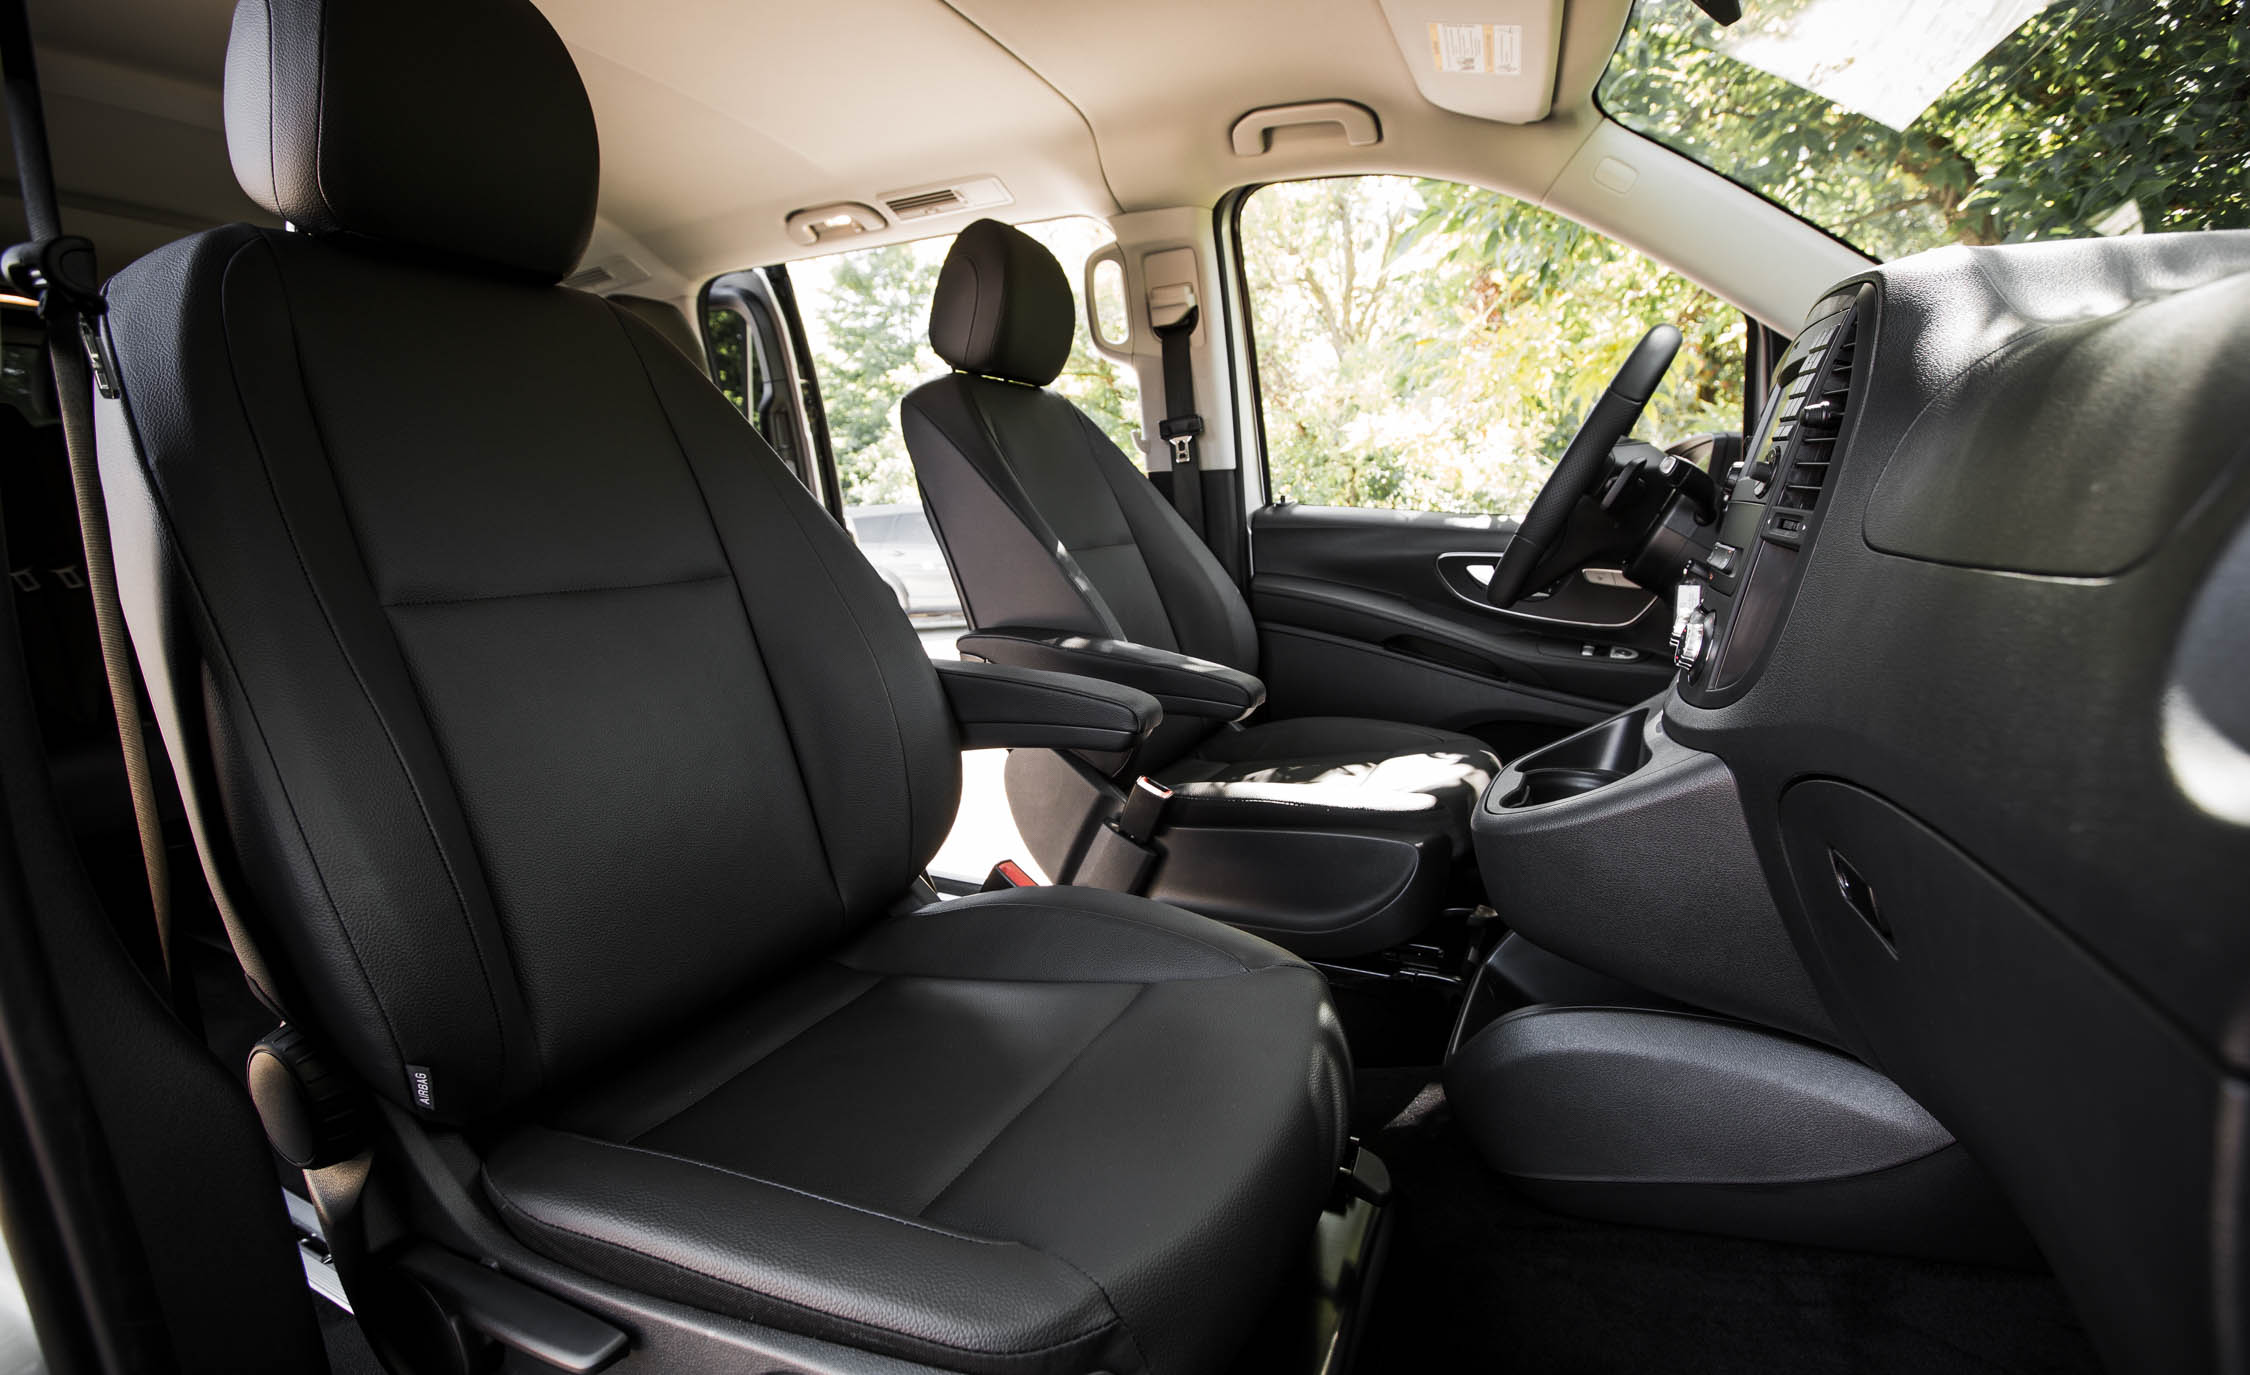 2016 Mercedes-Benz Metris Interior Front Passengers Seats